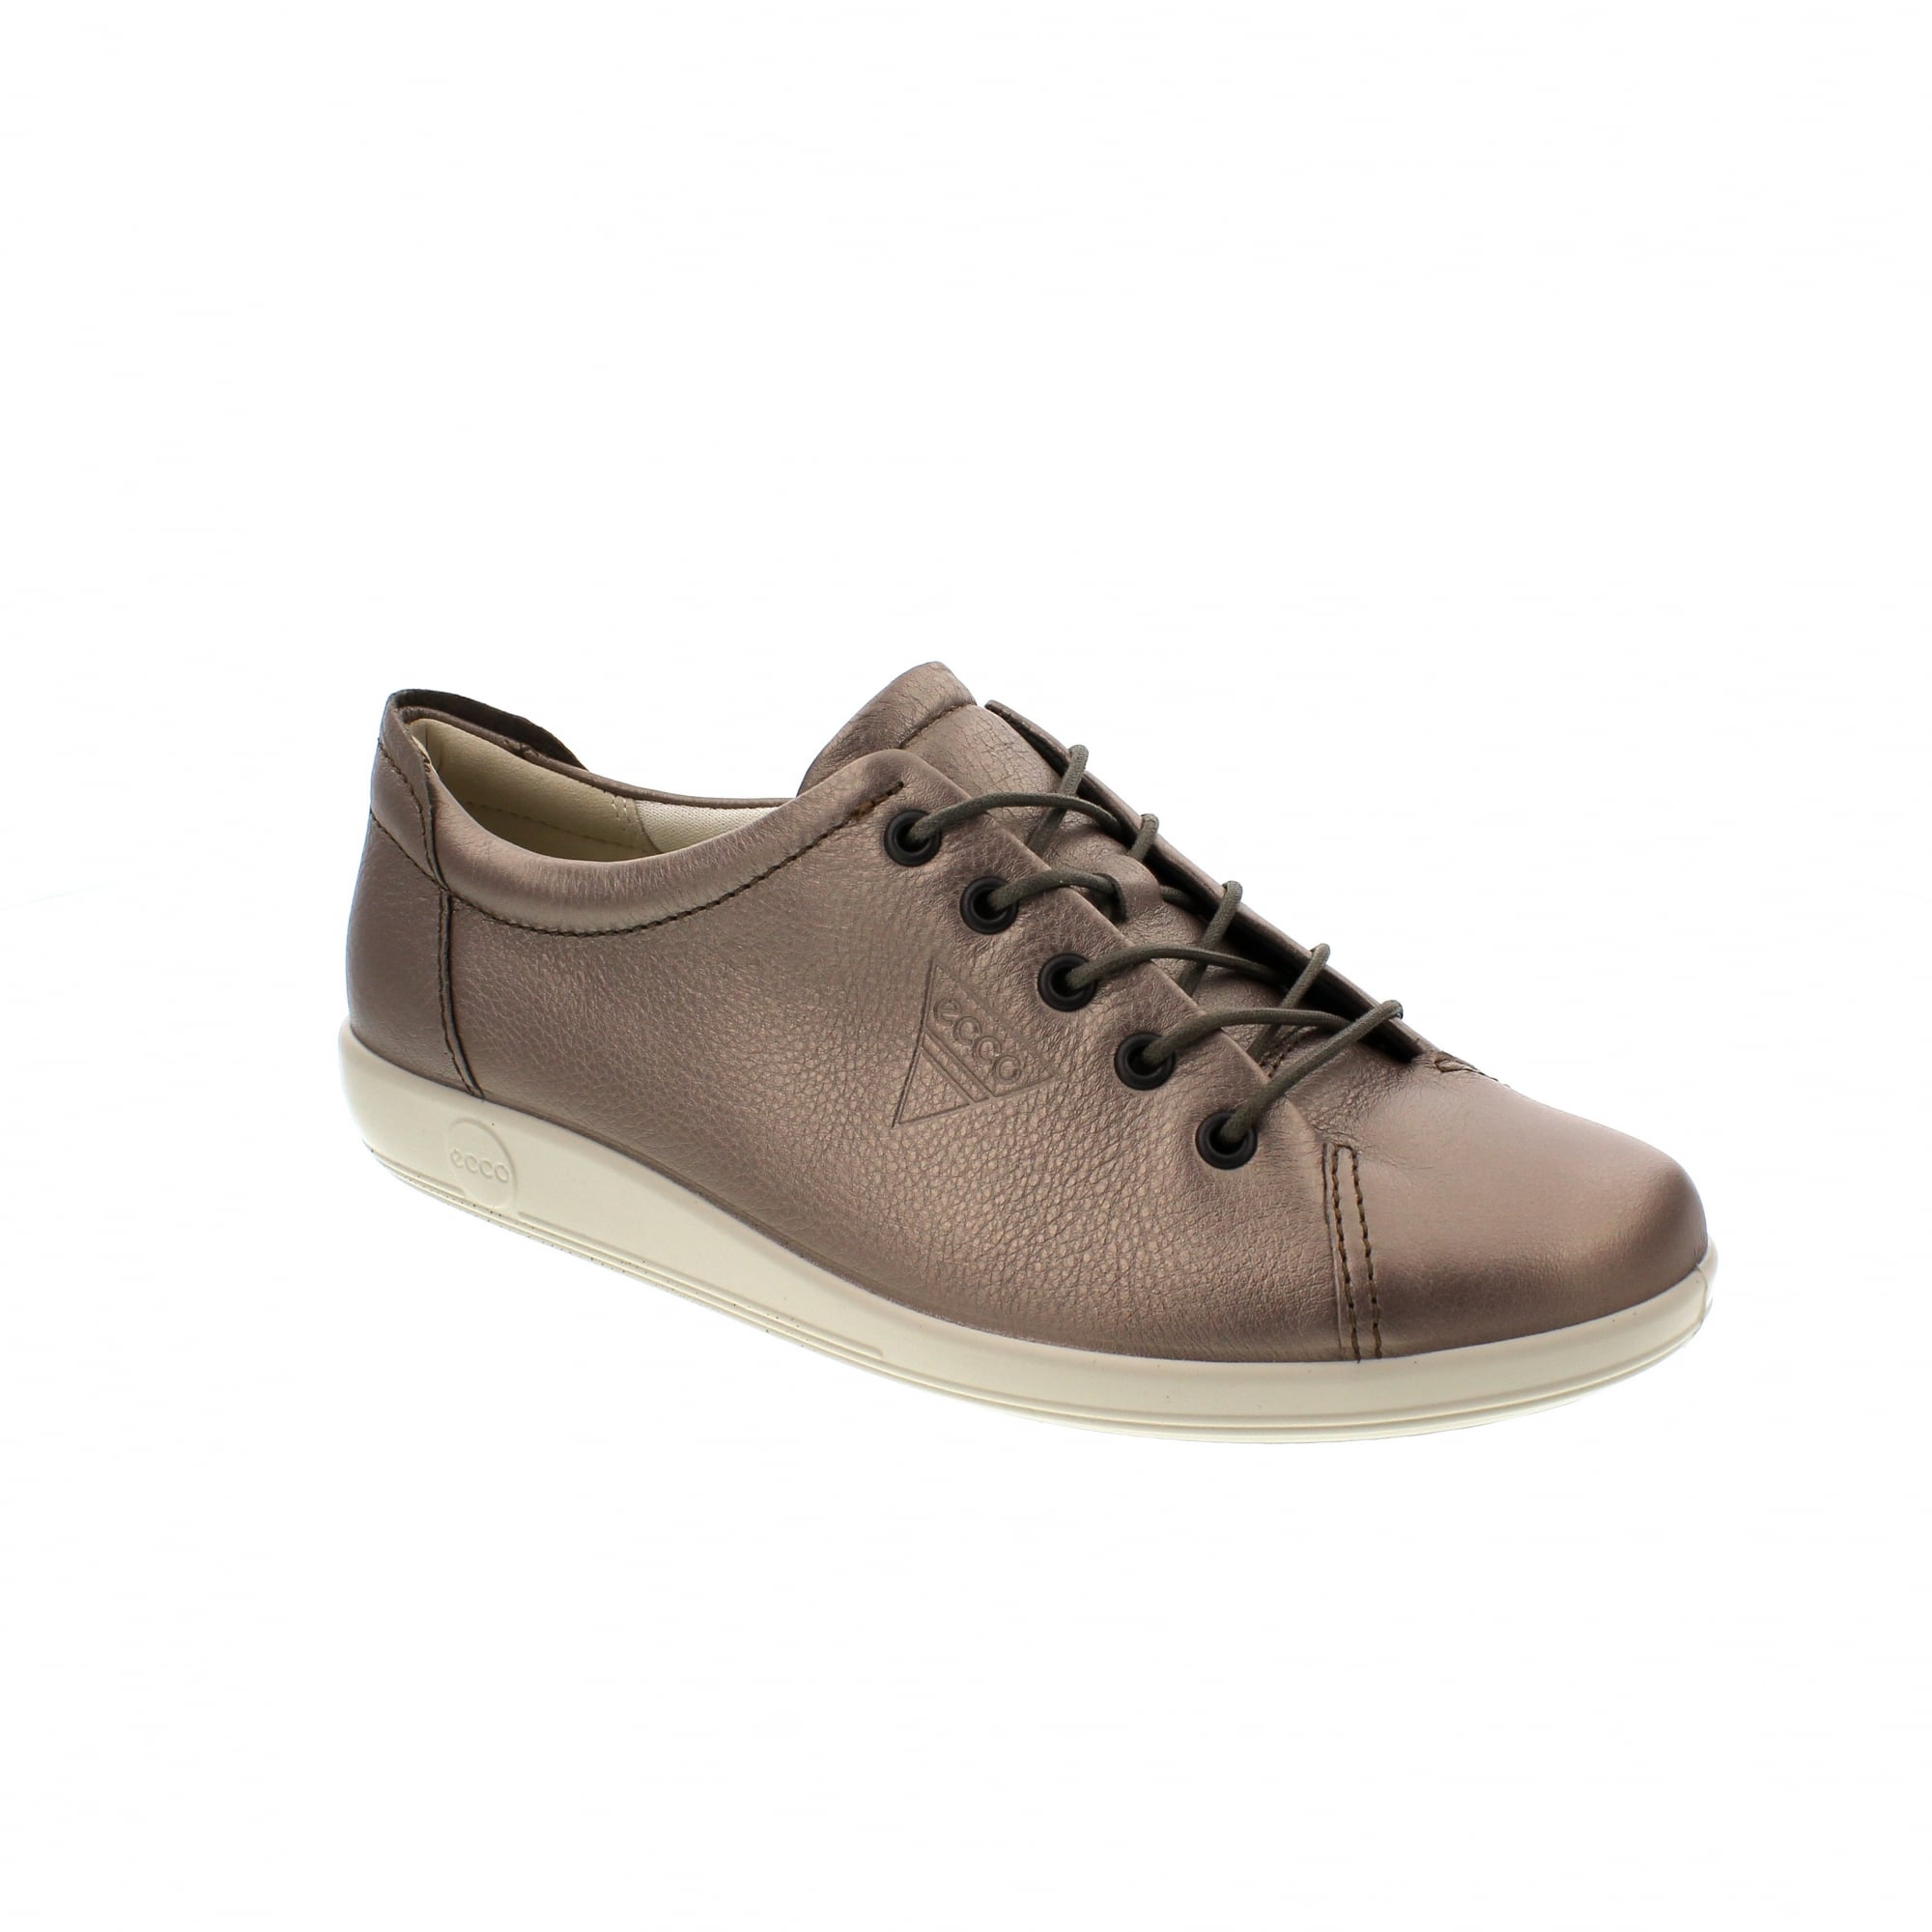 60ddd7daffa45 Ecco Soft 2.0 | 206503-01375 - Womens from Rogerson Shoes UK